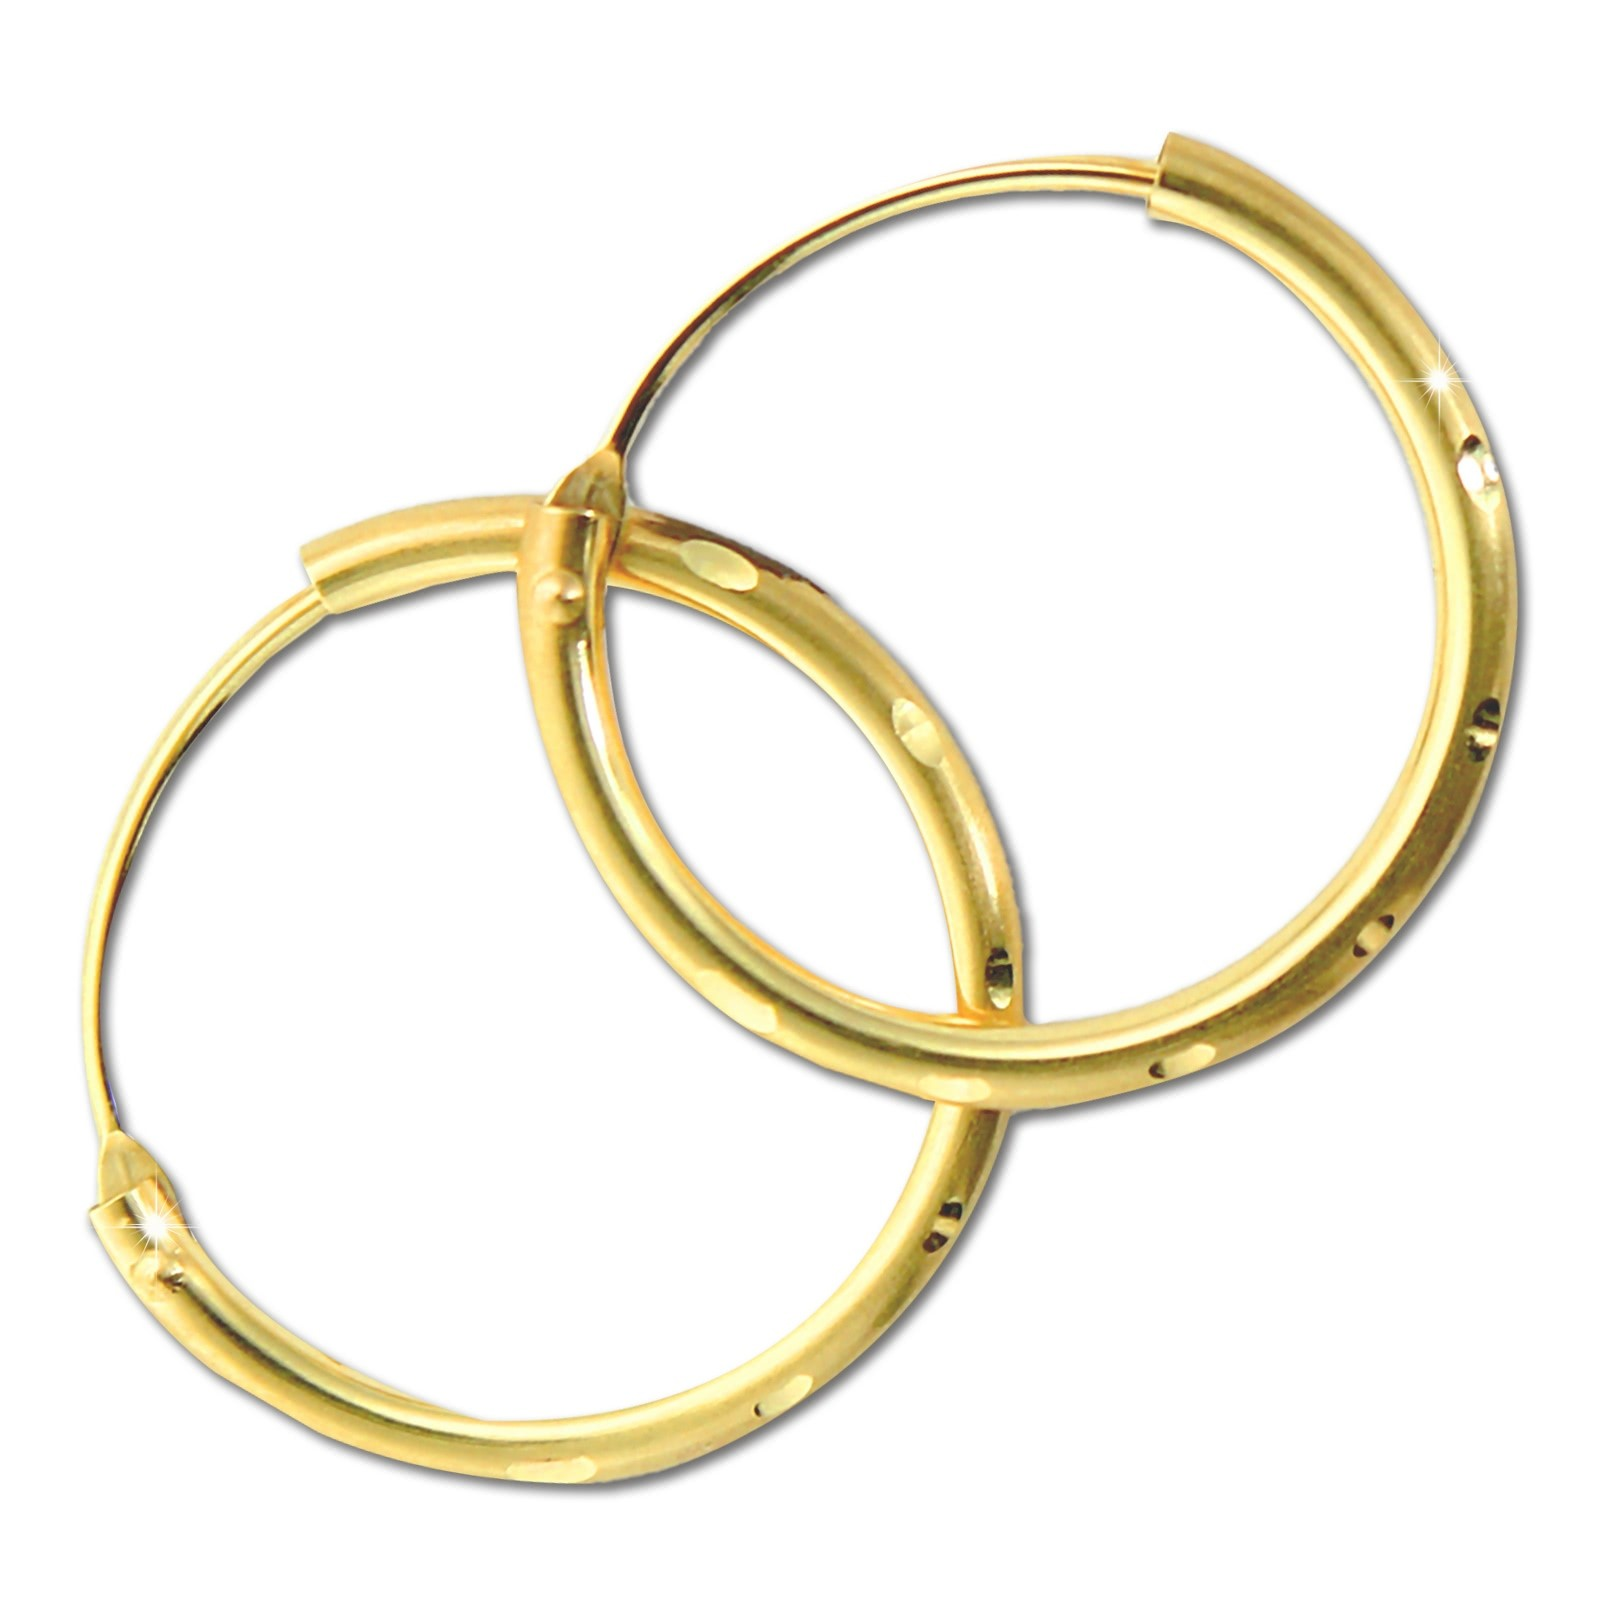 GoldDream Damen Creolen Ohrring 15mm Gelbgold 8 Karat GDOB00215Y